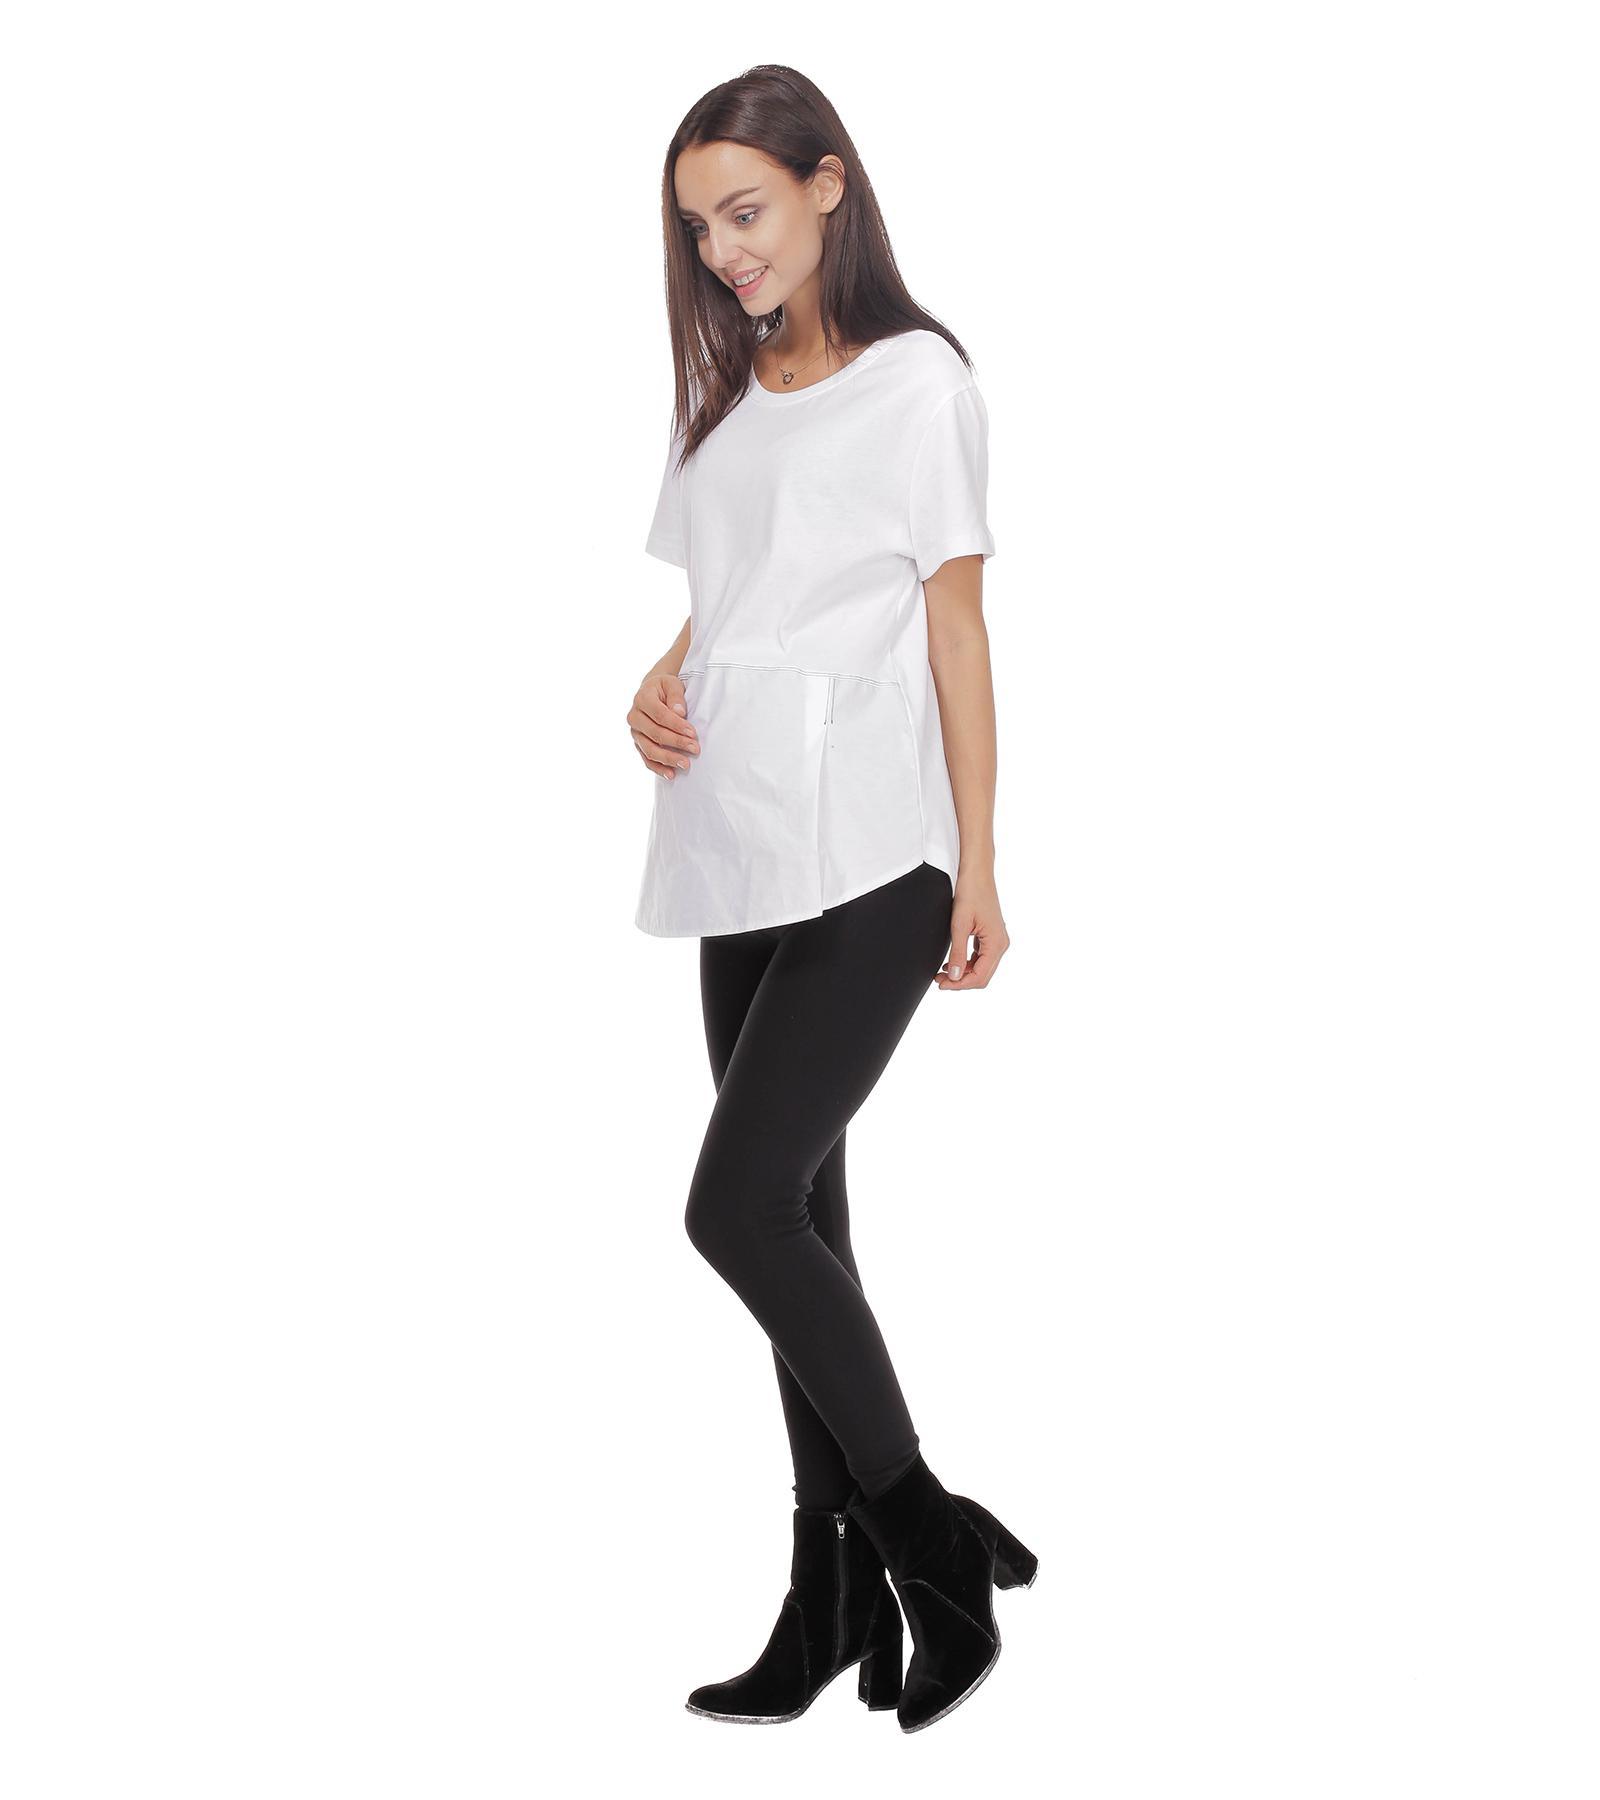 Legginsy ciążowe Exclusive Black Bensini®